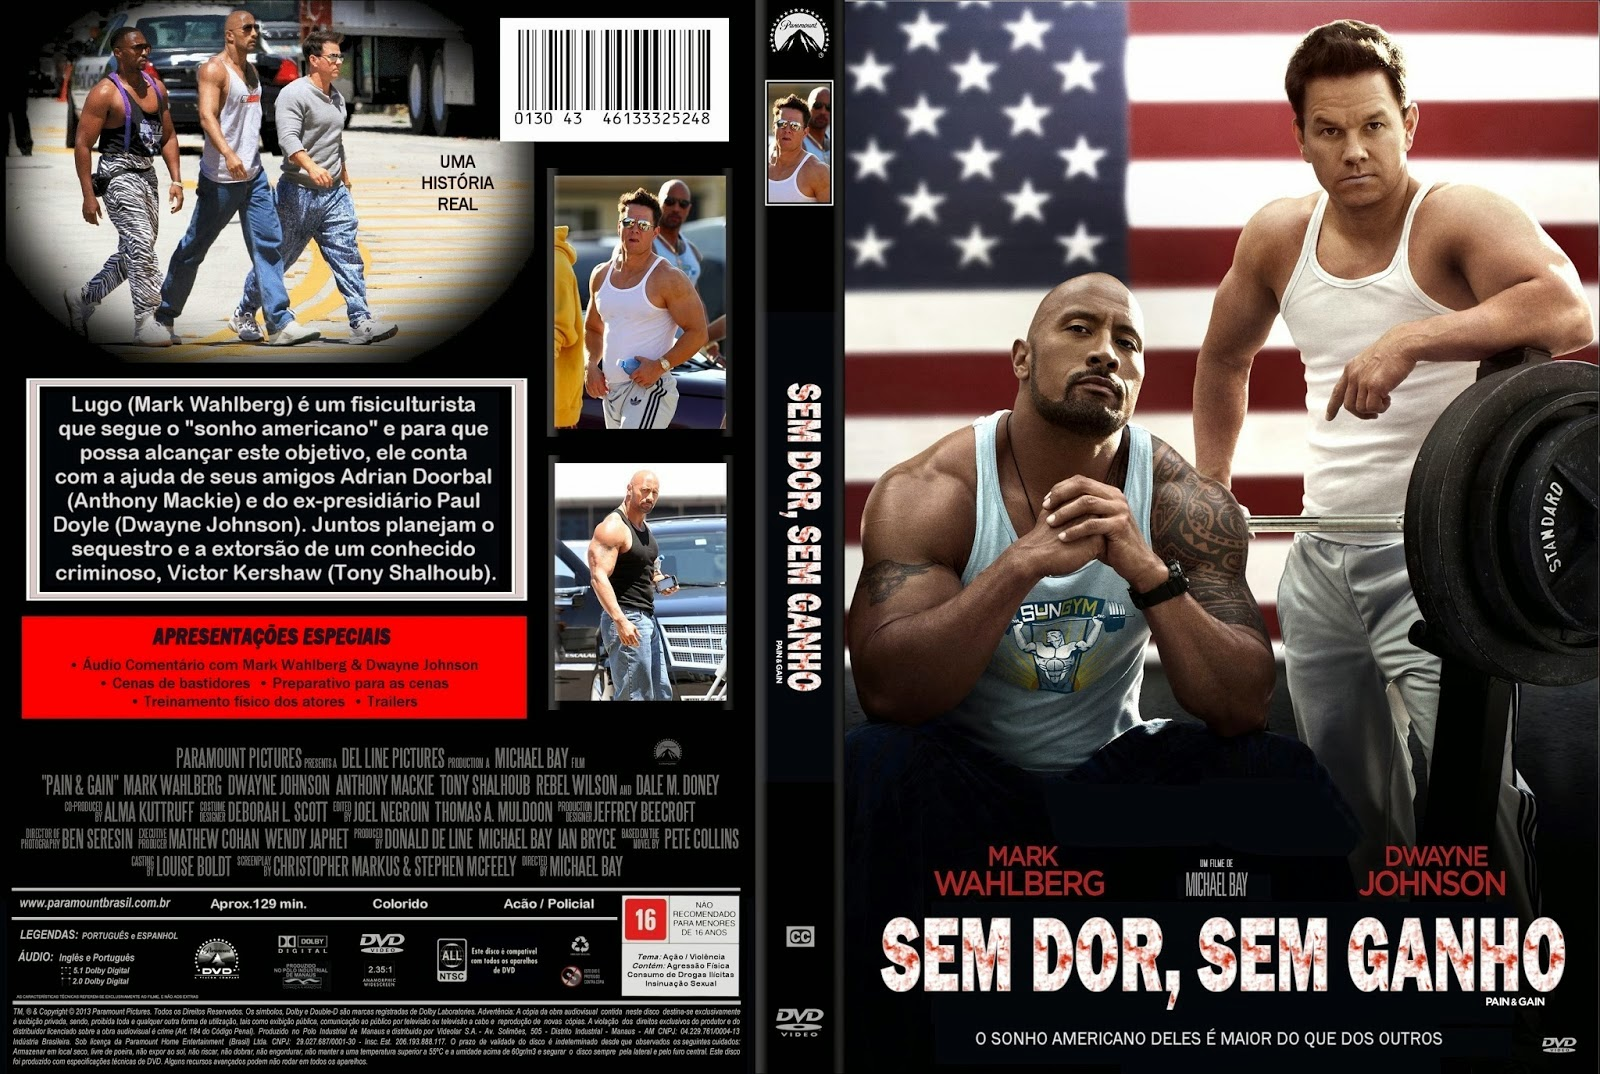 Sem Dor, Sem Ganho DVD Capa